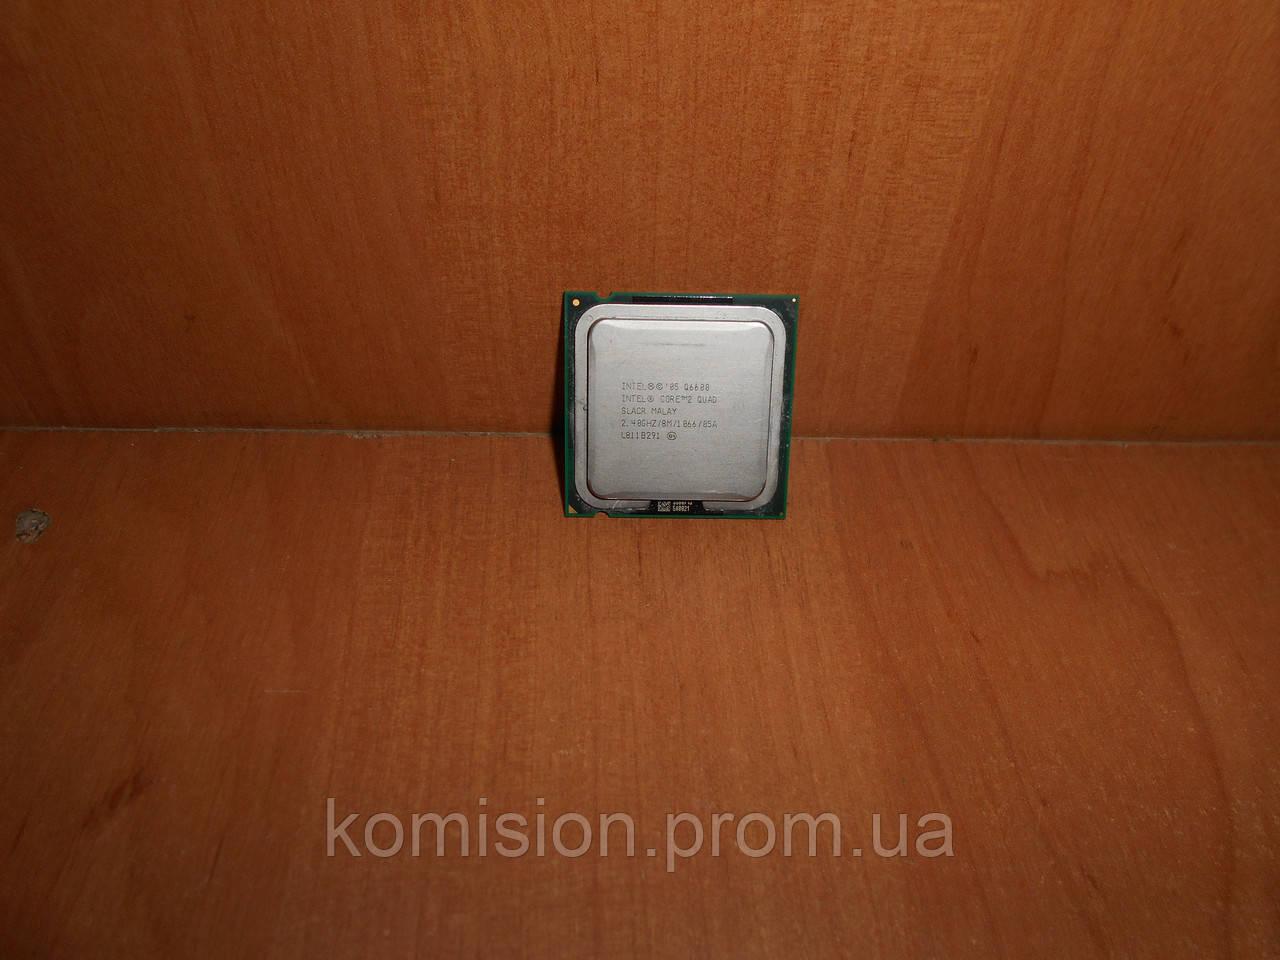 Процессор Intel Core 2 Quad Q6600 2,4 GHz s775 4 ядра